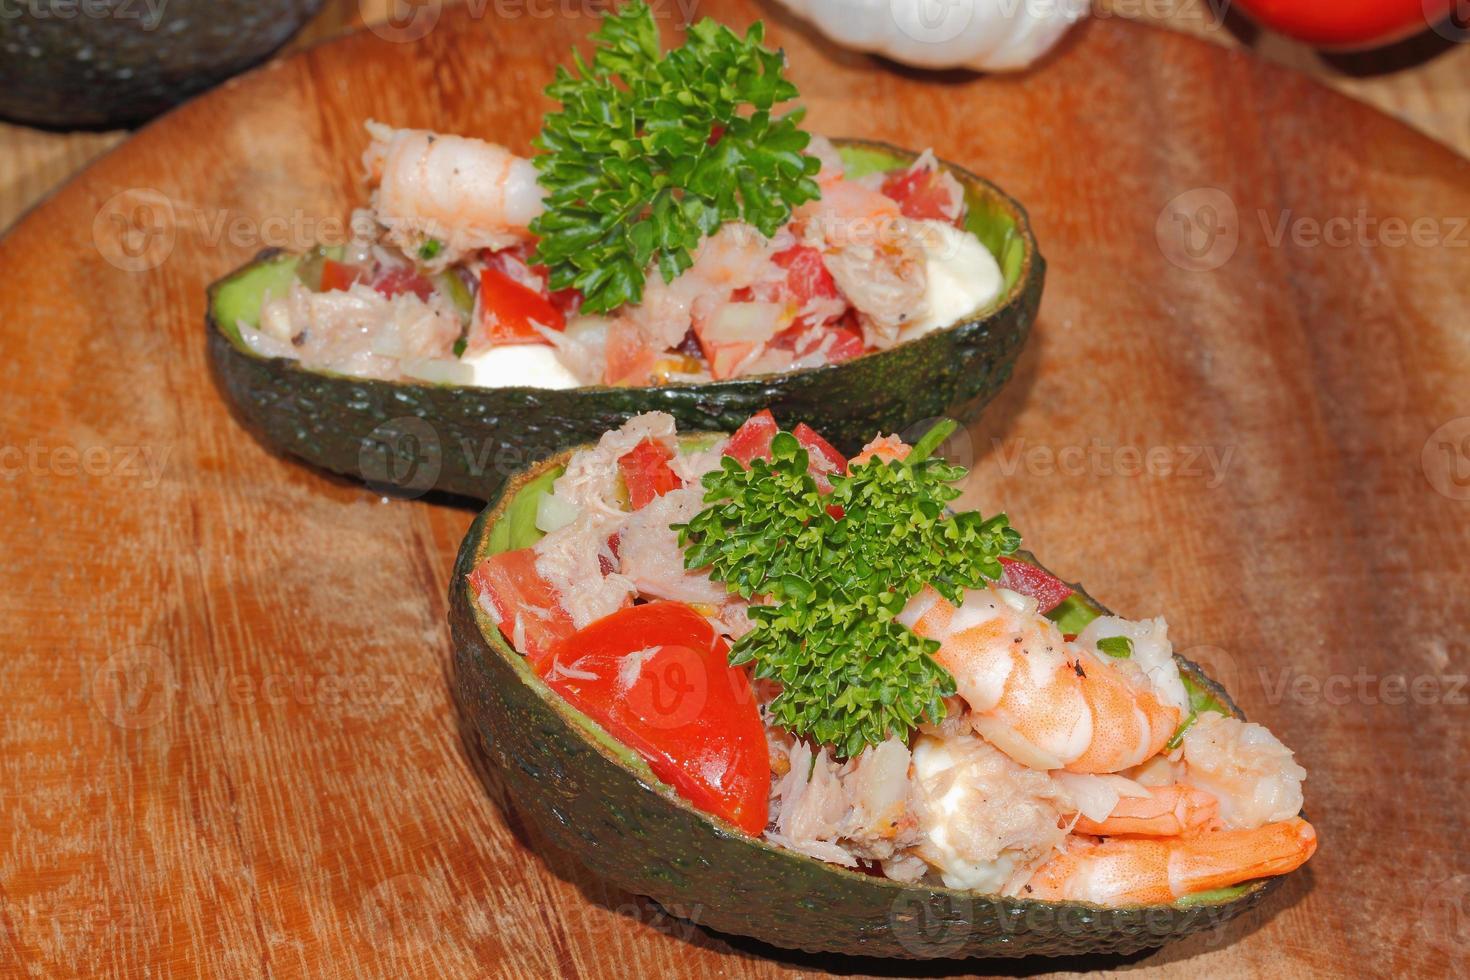 , Avocado, Guacamole, Garnelen, Thunfisch, Salat, Guacamole foto